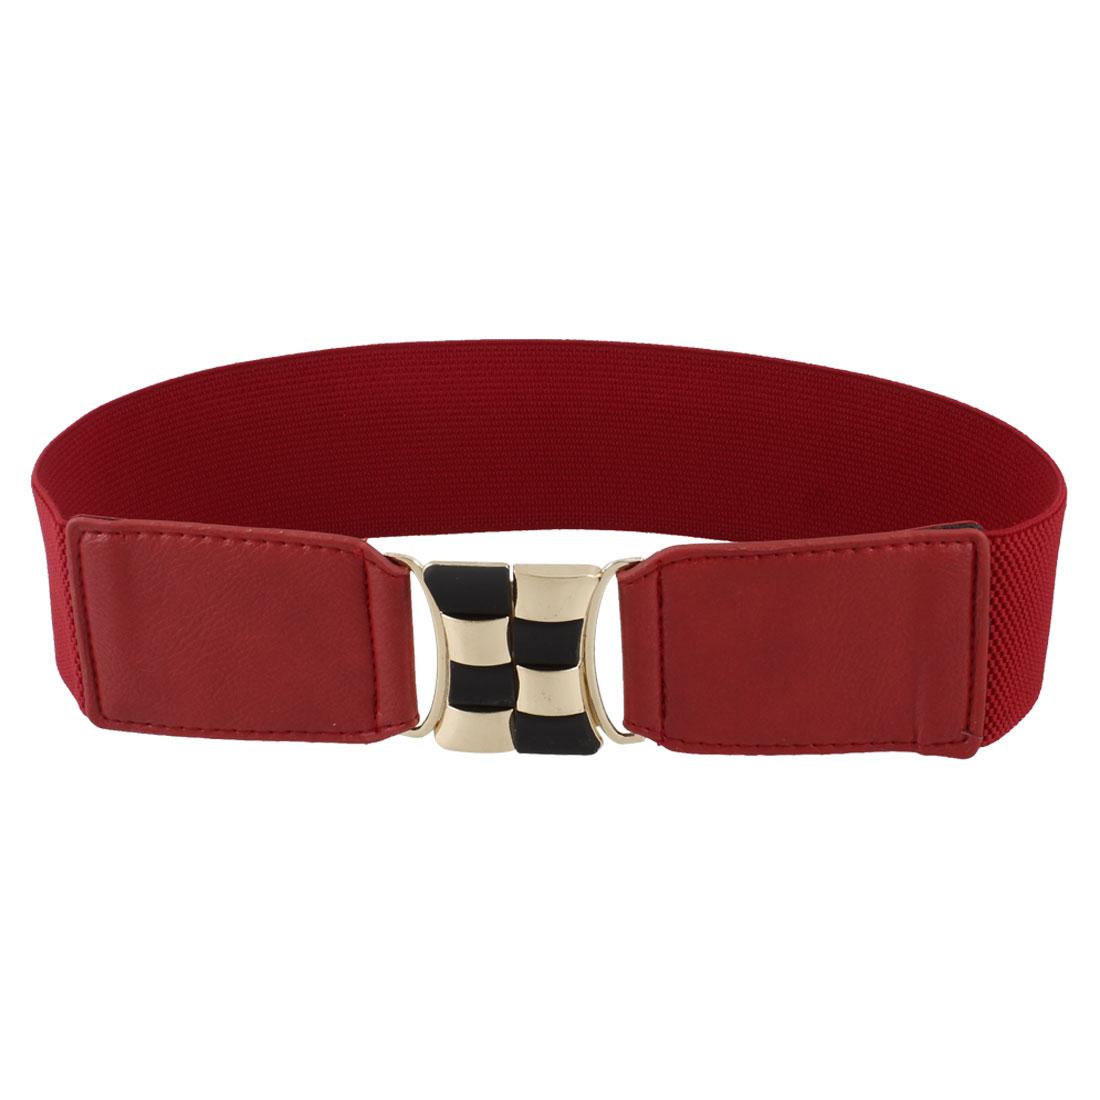 Elastic Band Gold Tone Black Checks Decor 6cm Width Waist Belt Red for Lady